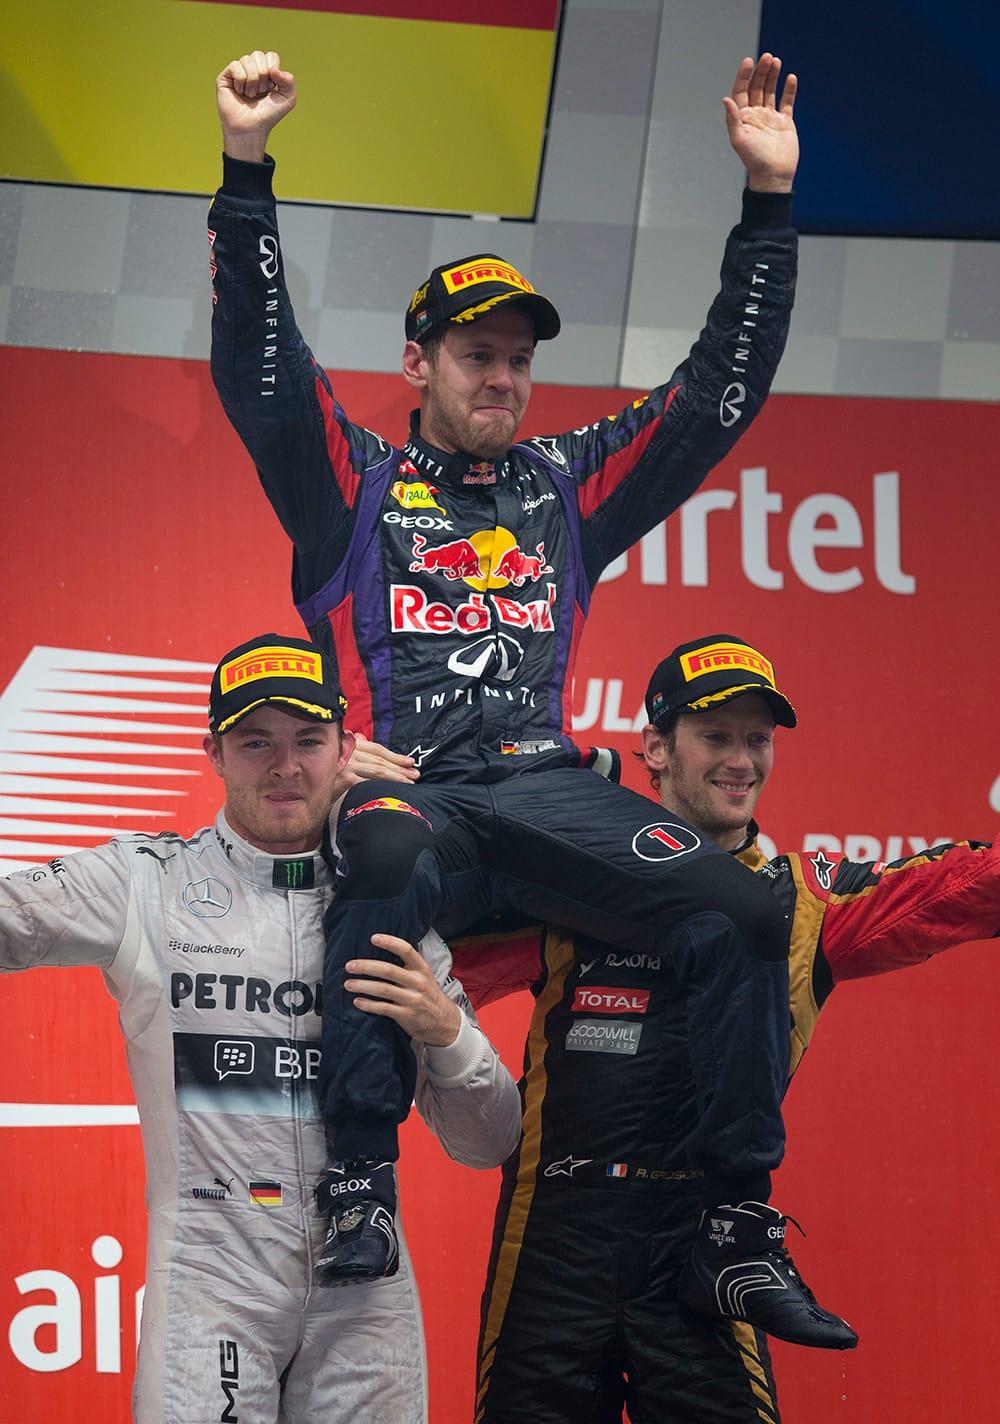 F1: Indian GP 2013 | News | Zee News